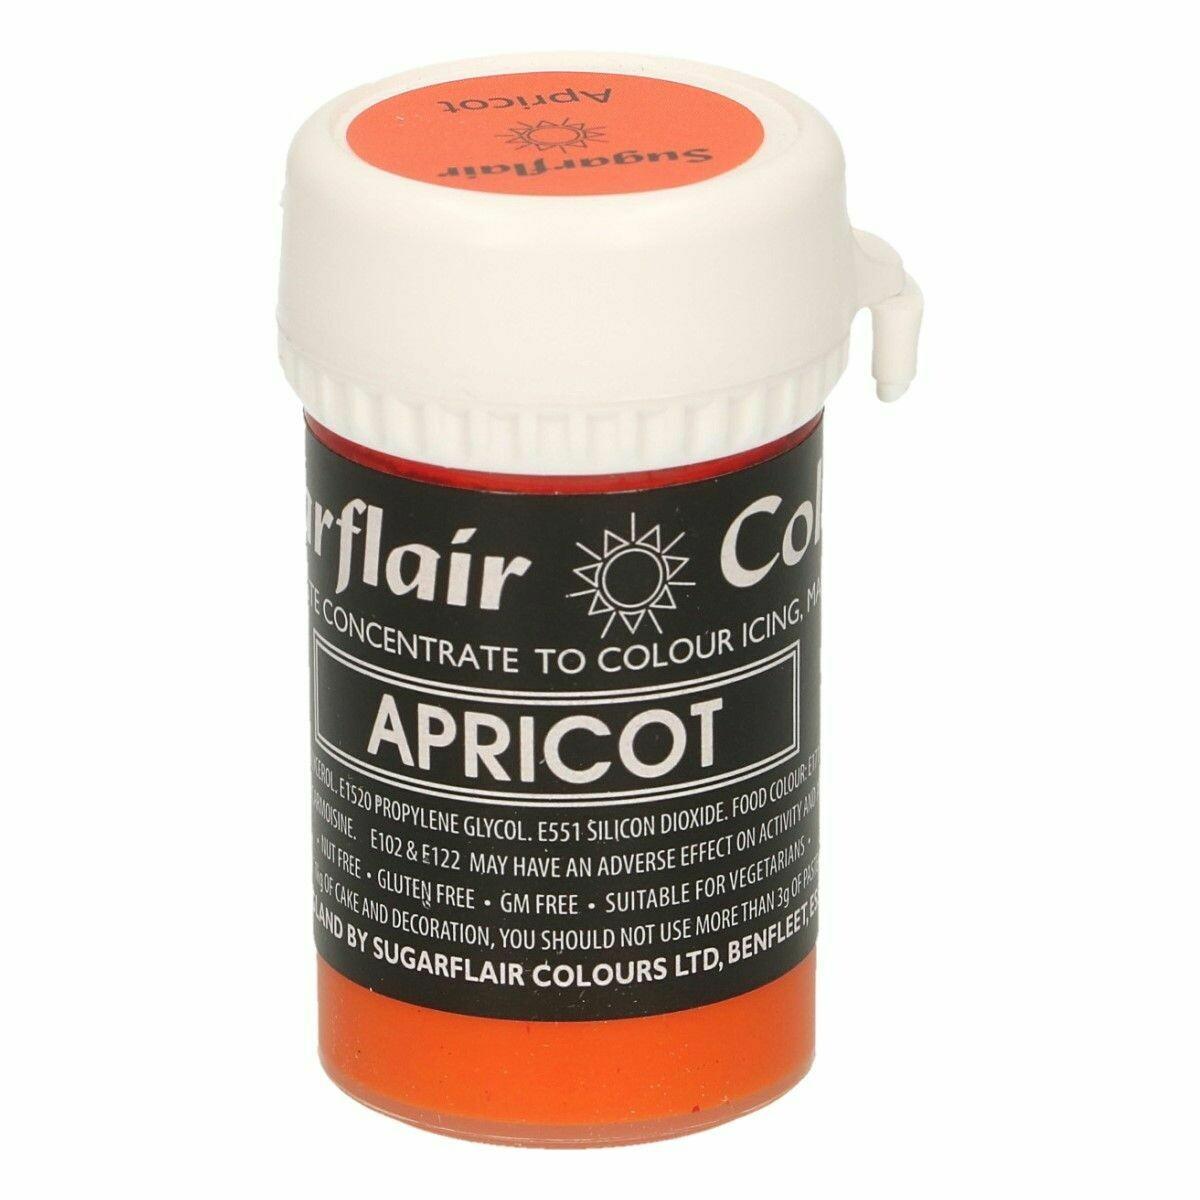 Sugarflair Paste Colours -PASTEL APRICOT -Χρώμα σε Πάστα -Παστέλ Βερικοκί